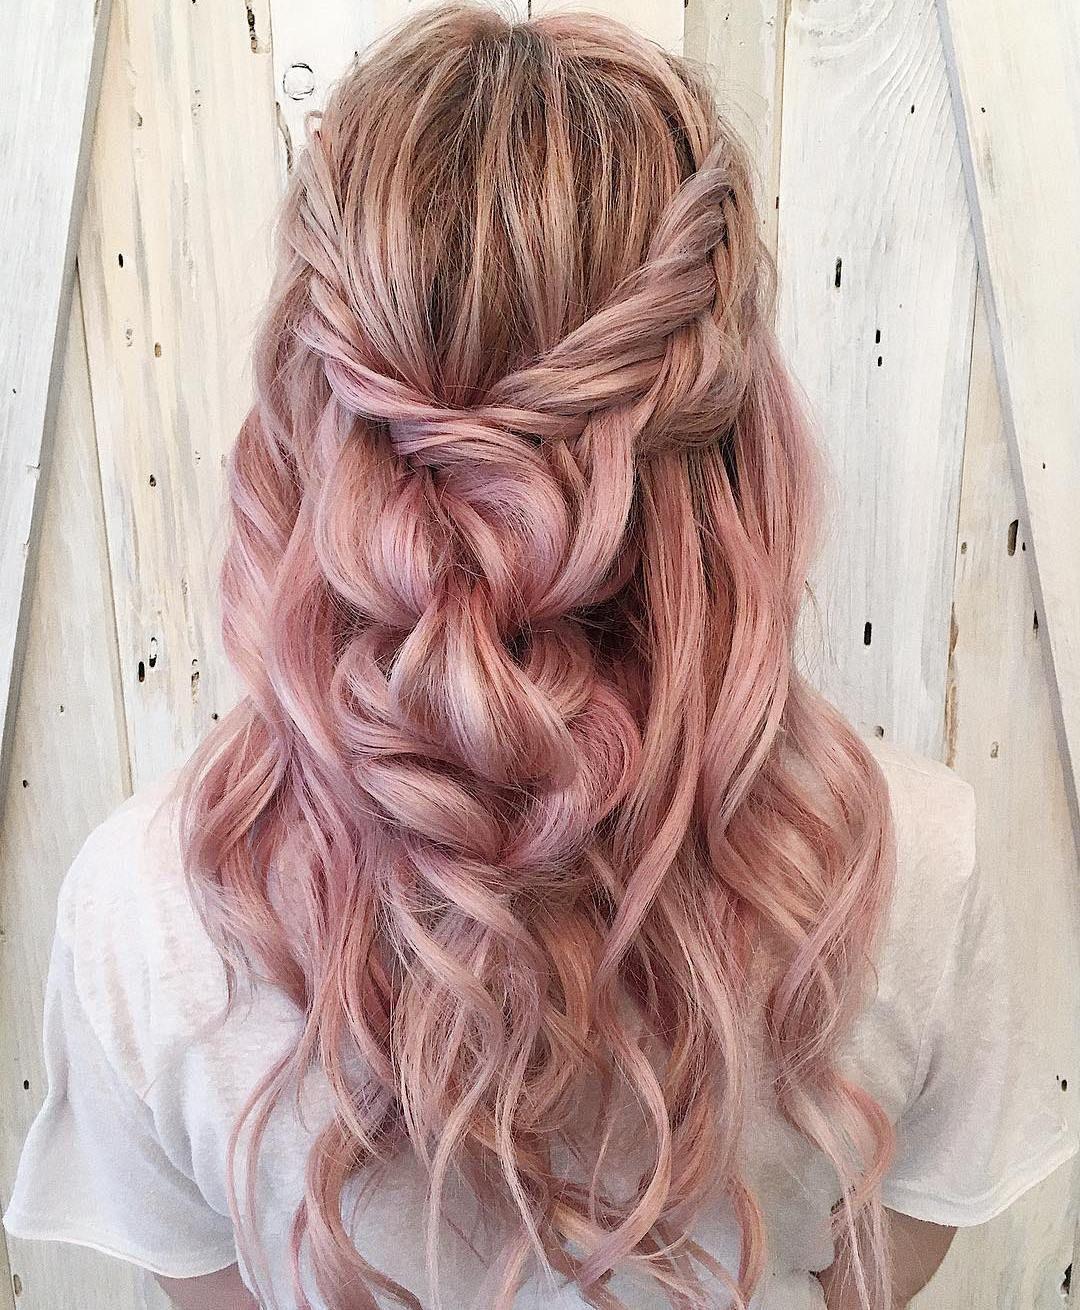 39 Trendy + Messy & Chic Braided Hairstyles | Pastel braid half up half down hairstyle #halfuphalfdown #braids #hairstyles